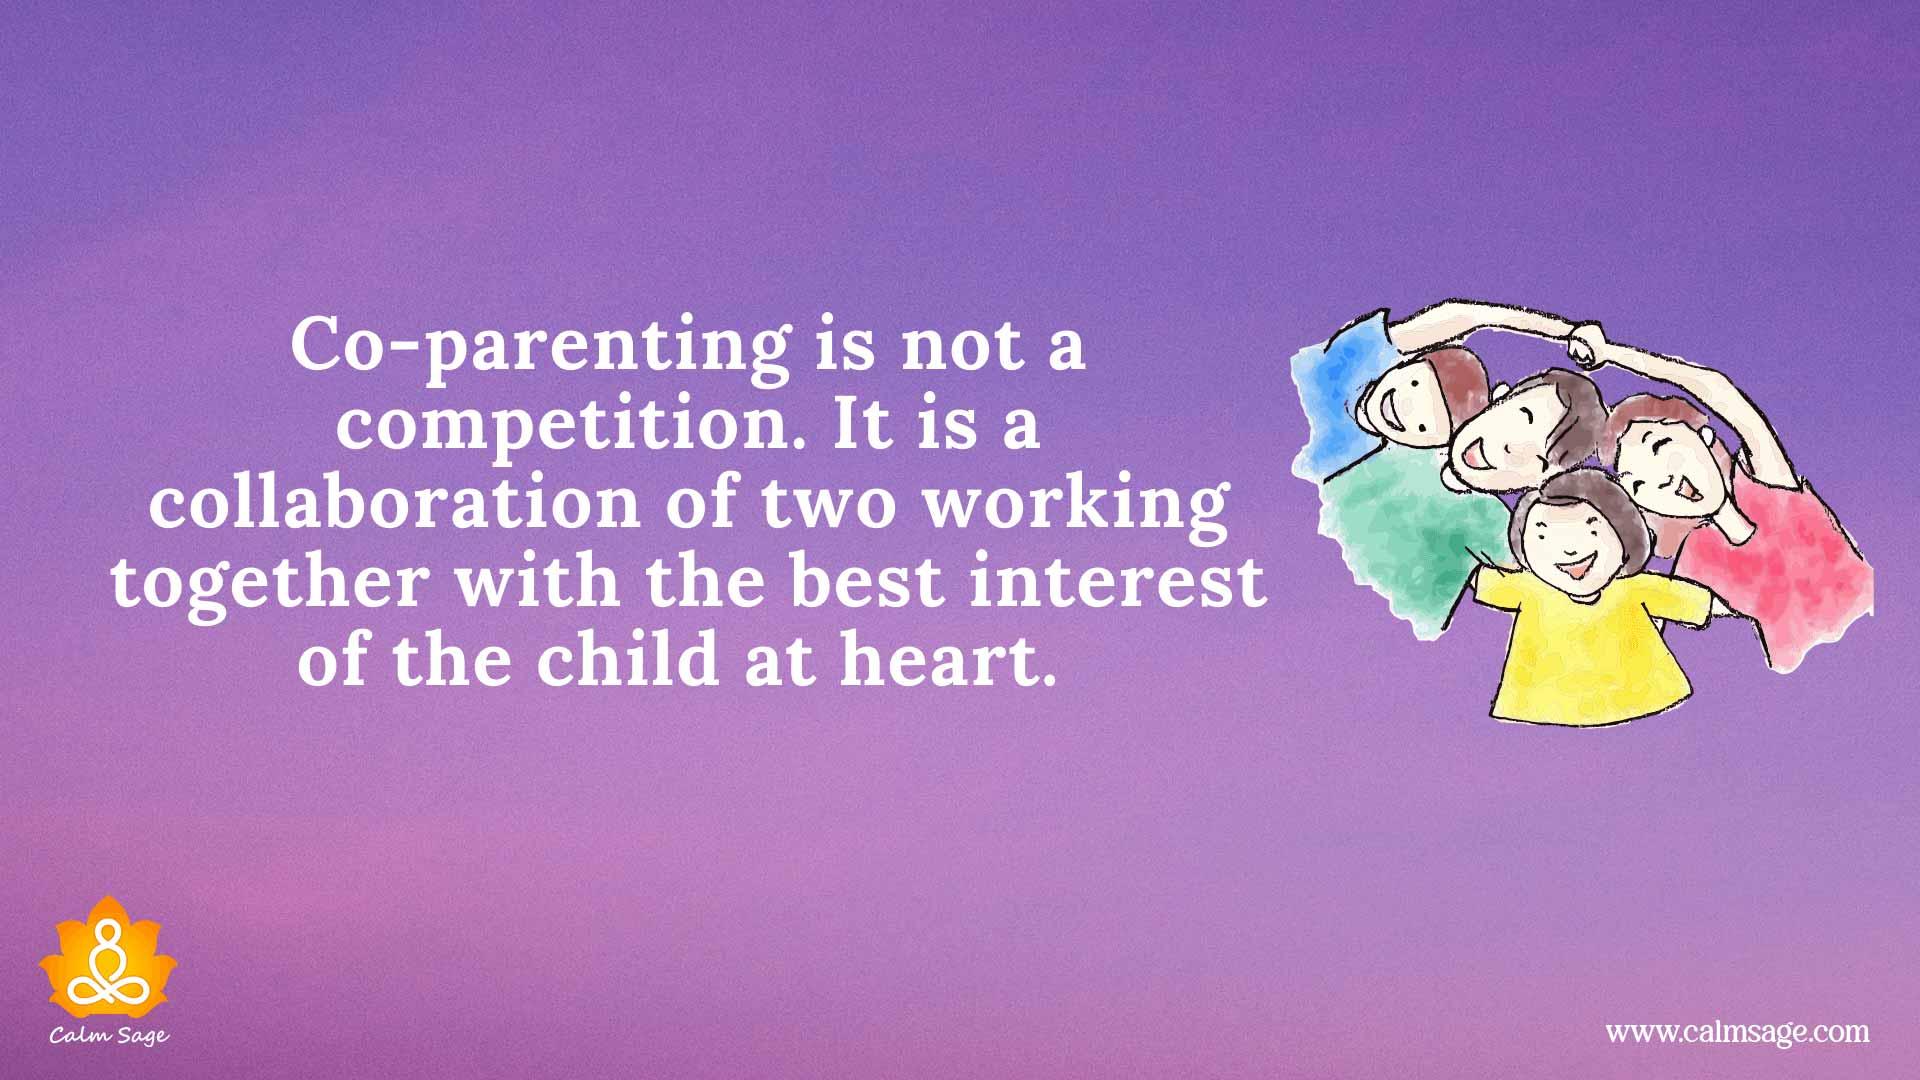 Struggles of Co-parenting